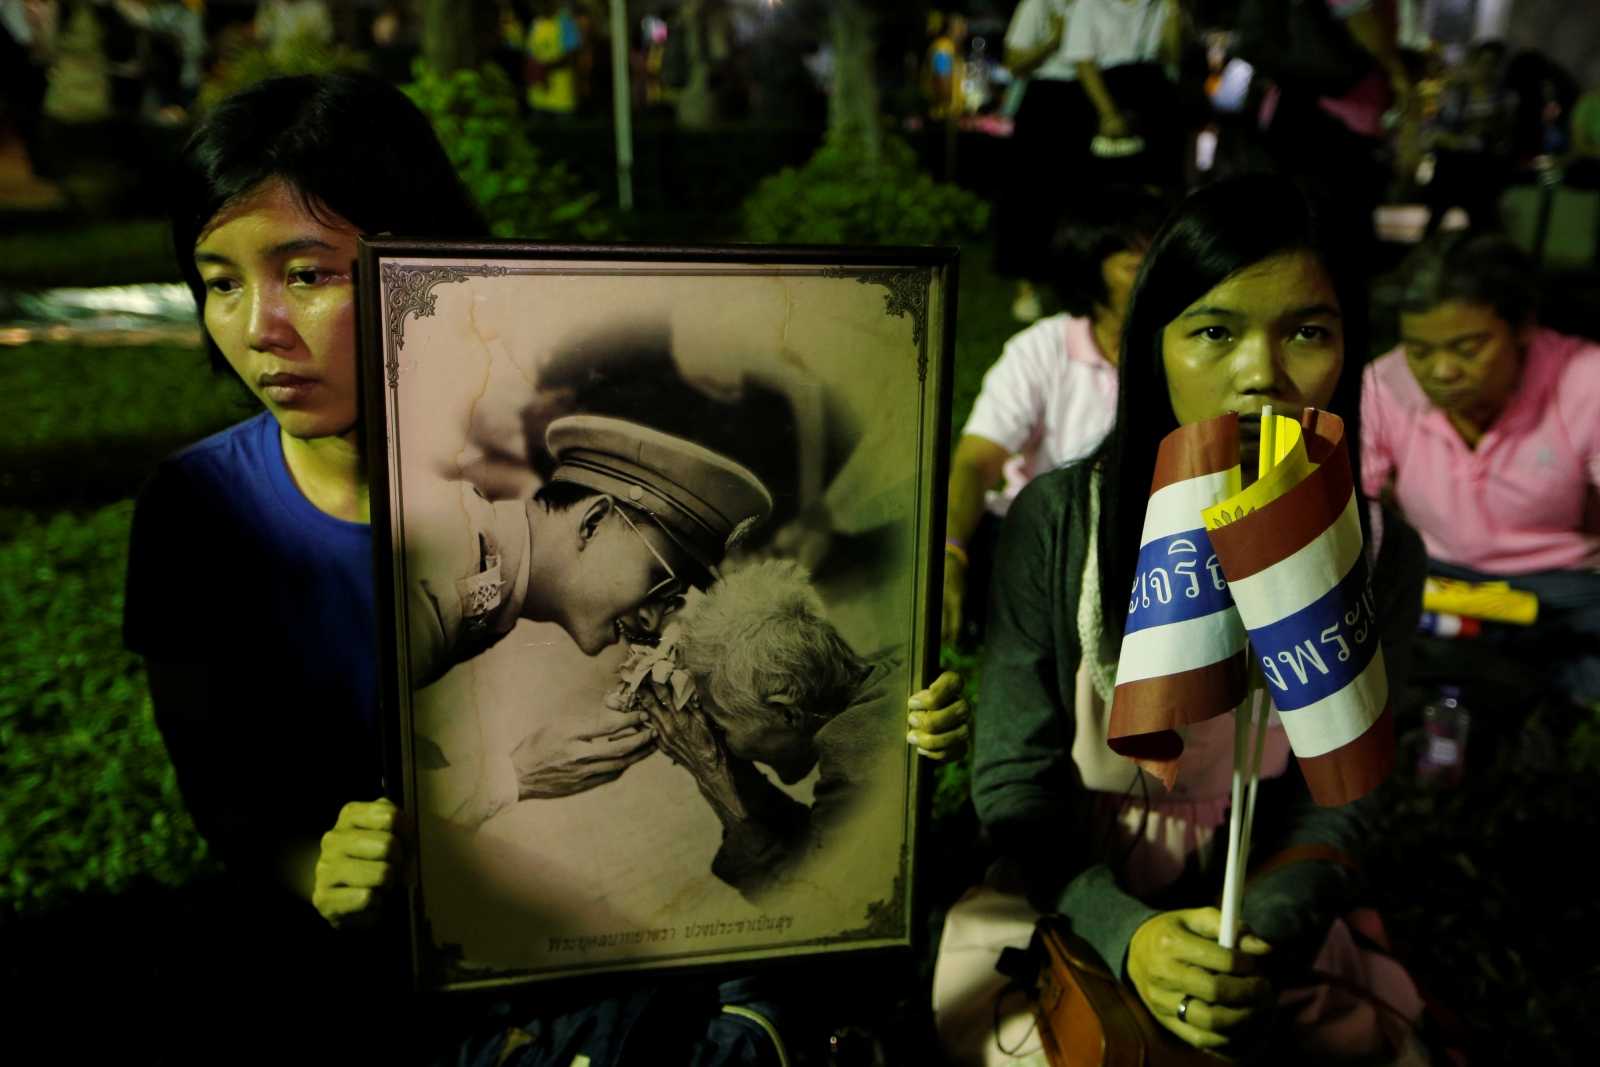 Thailand's King Bhumibol Adulyadej has died